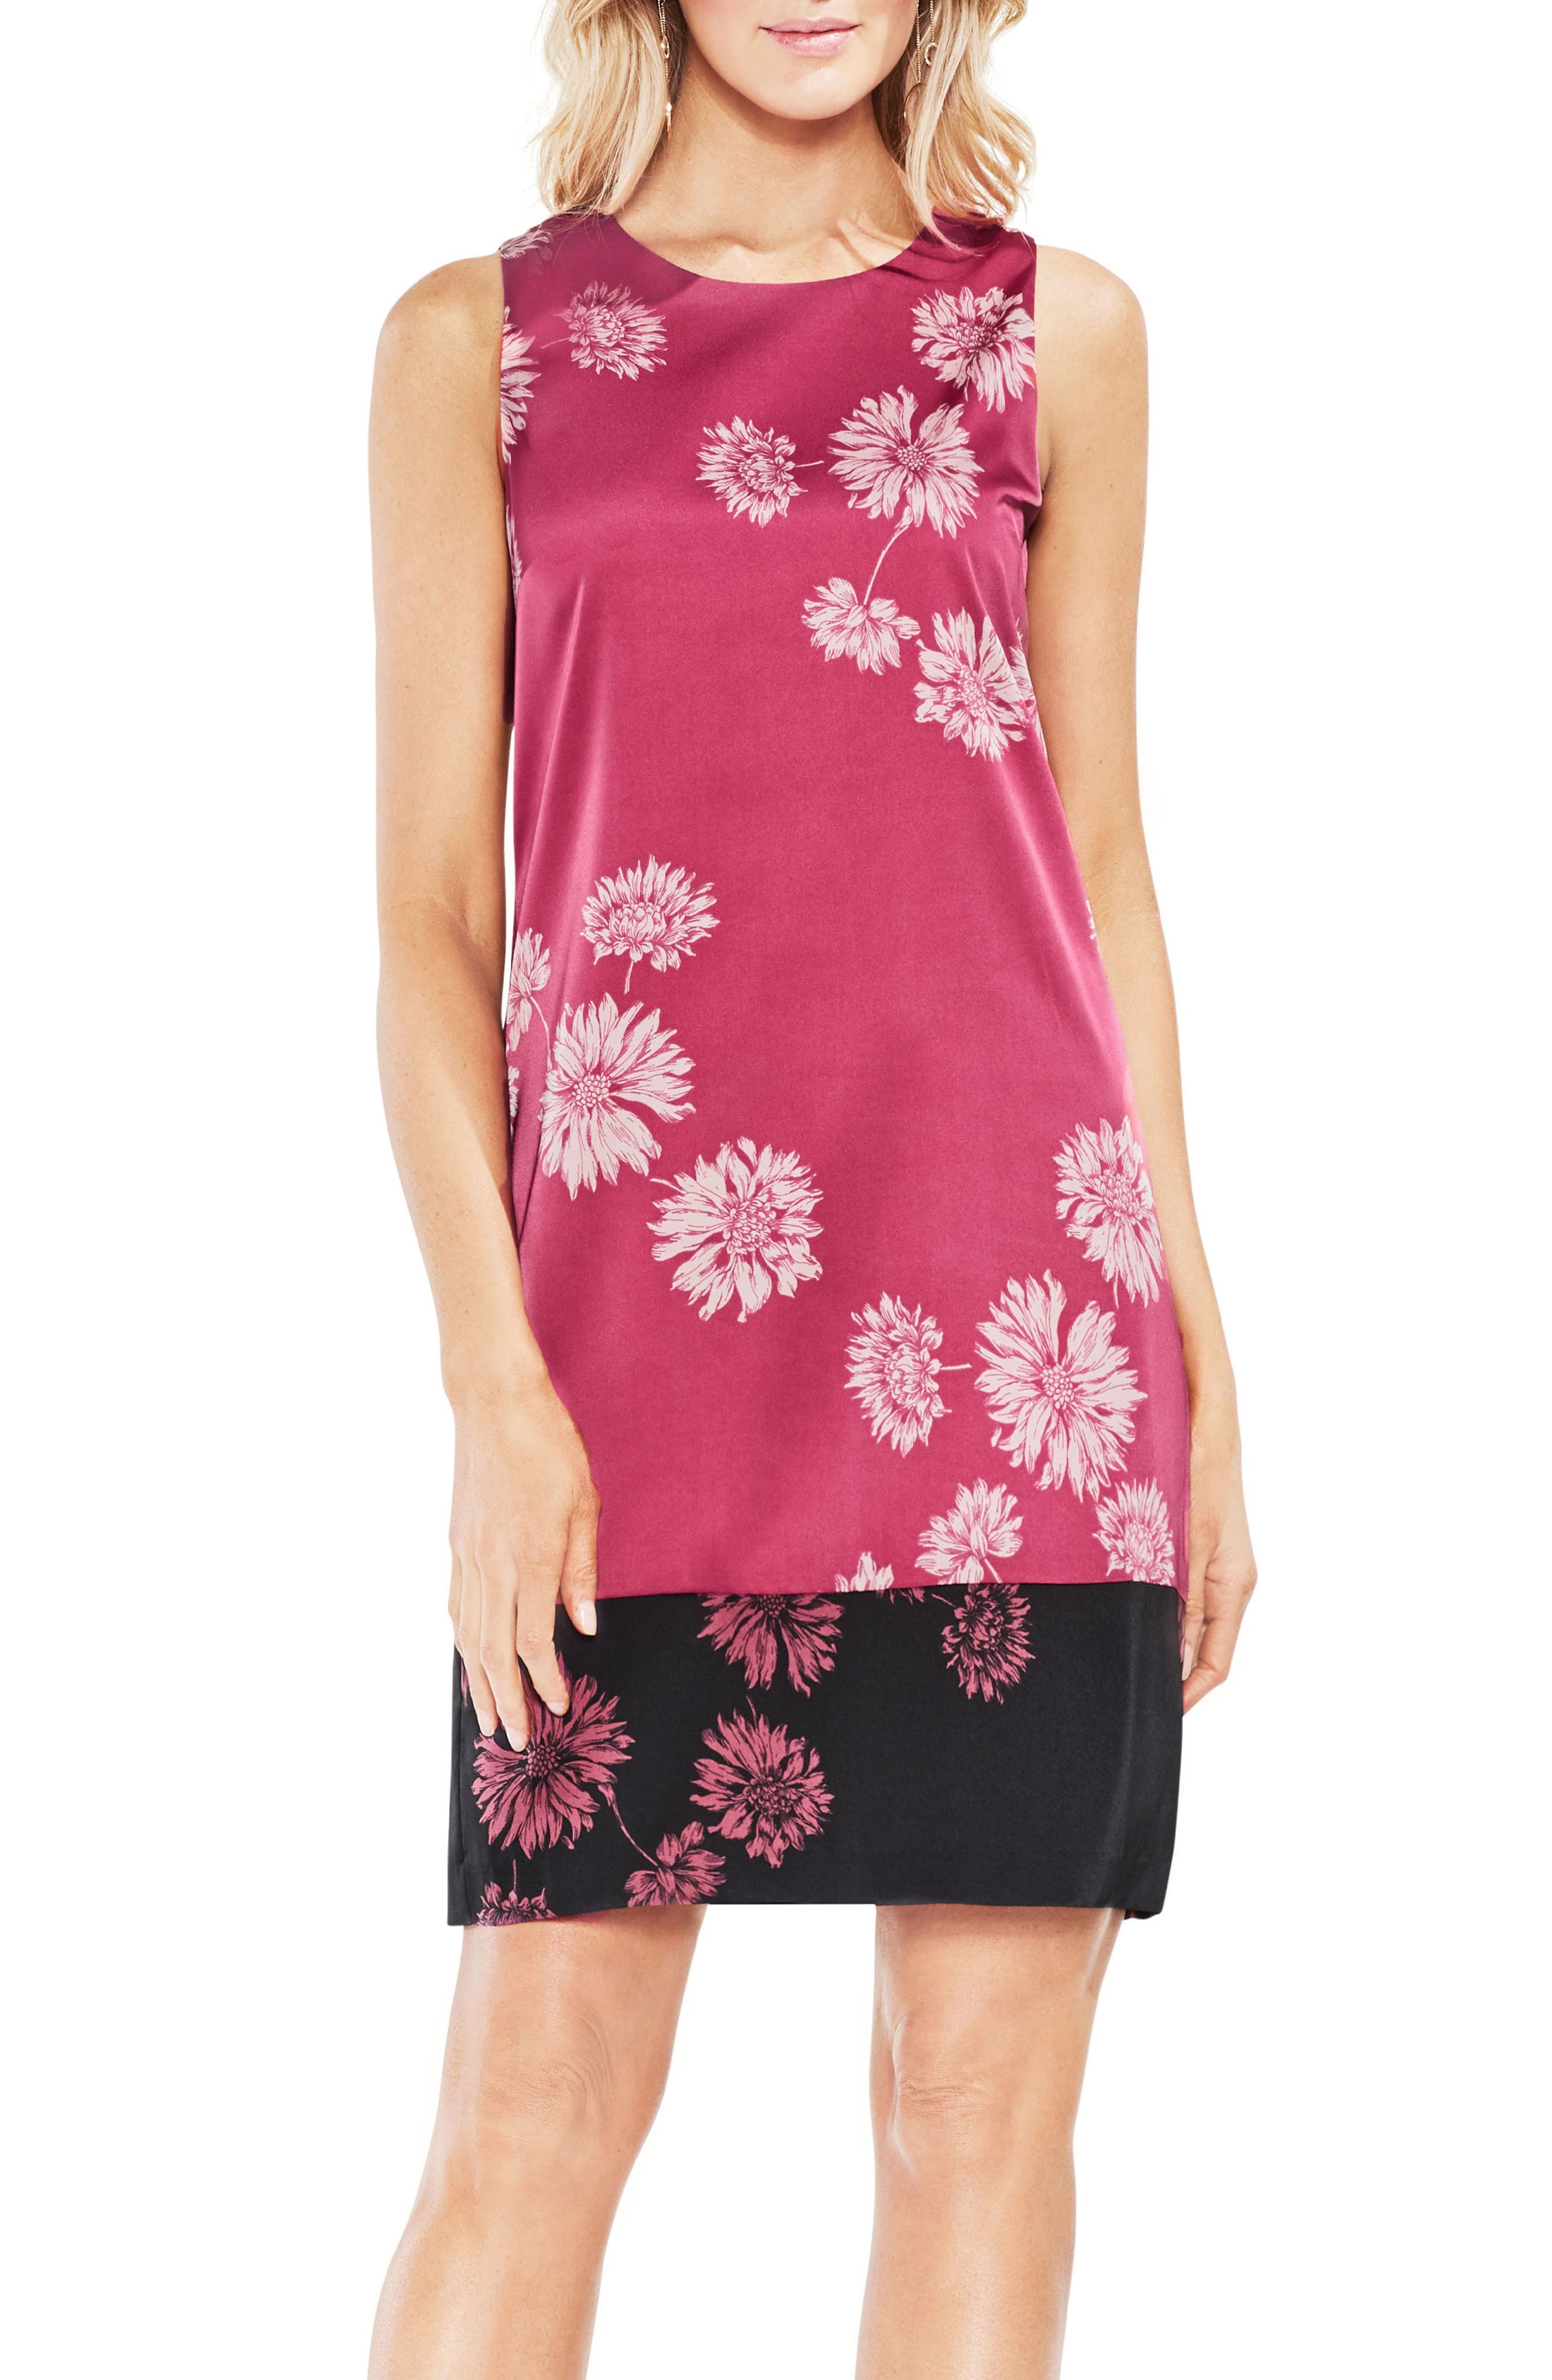 Chateau Floral Shift Dress,                         Main,                         color, 888-Pink Rose